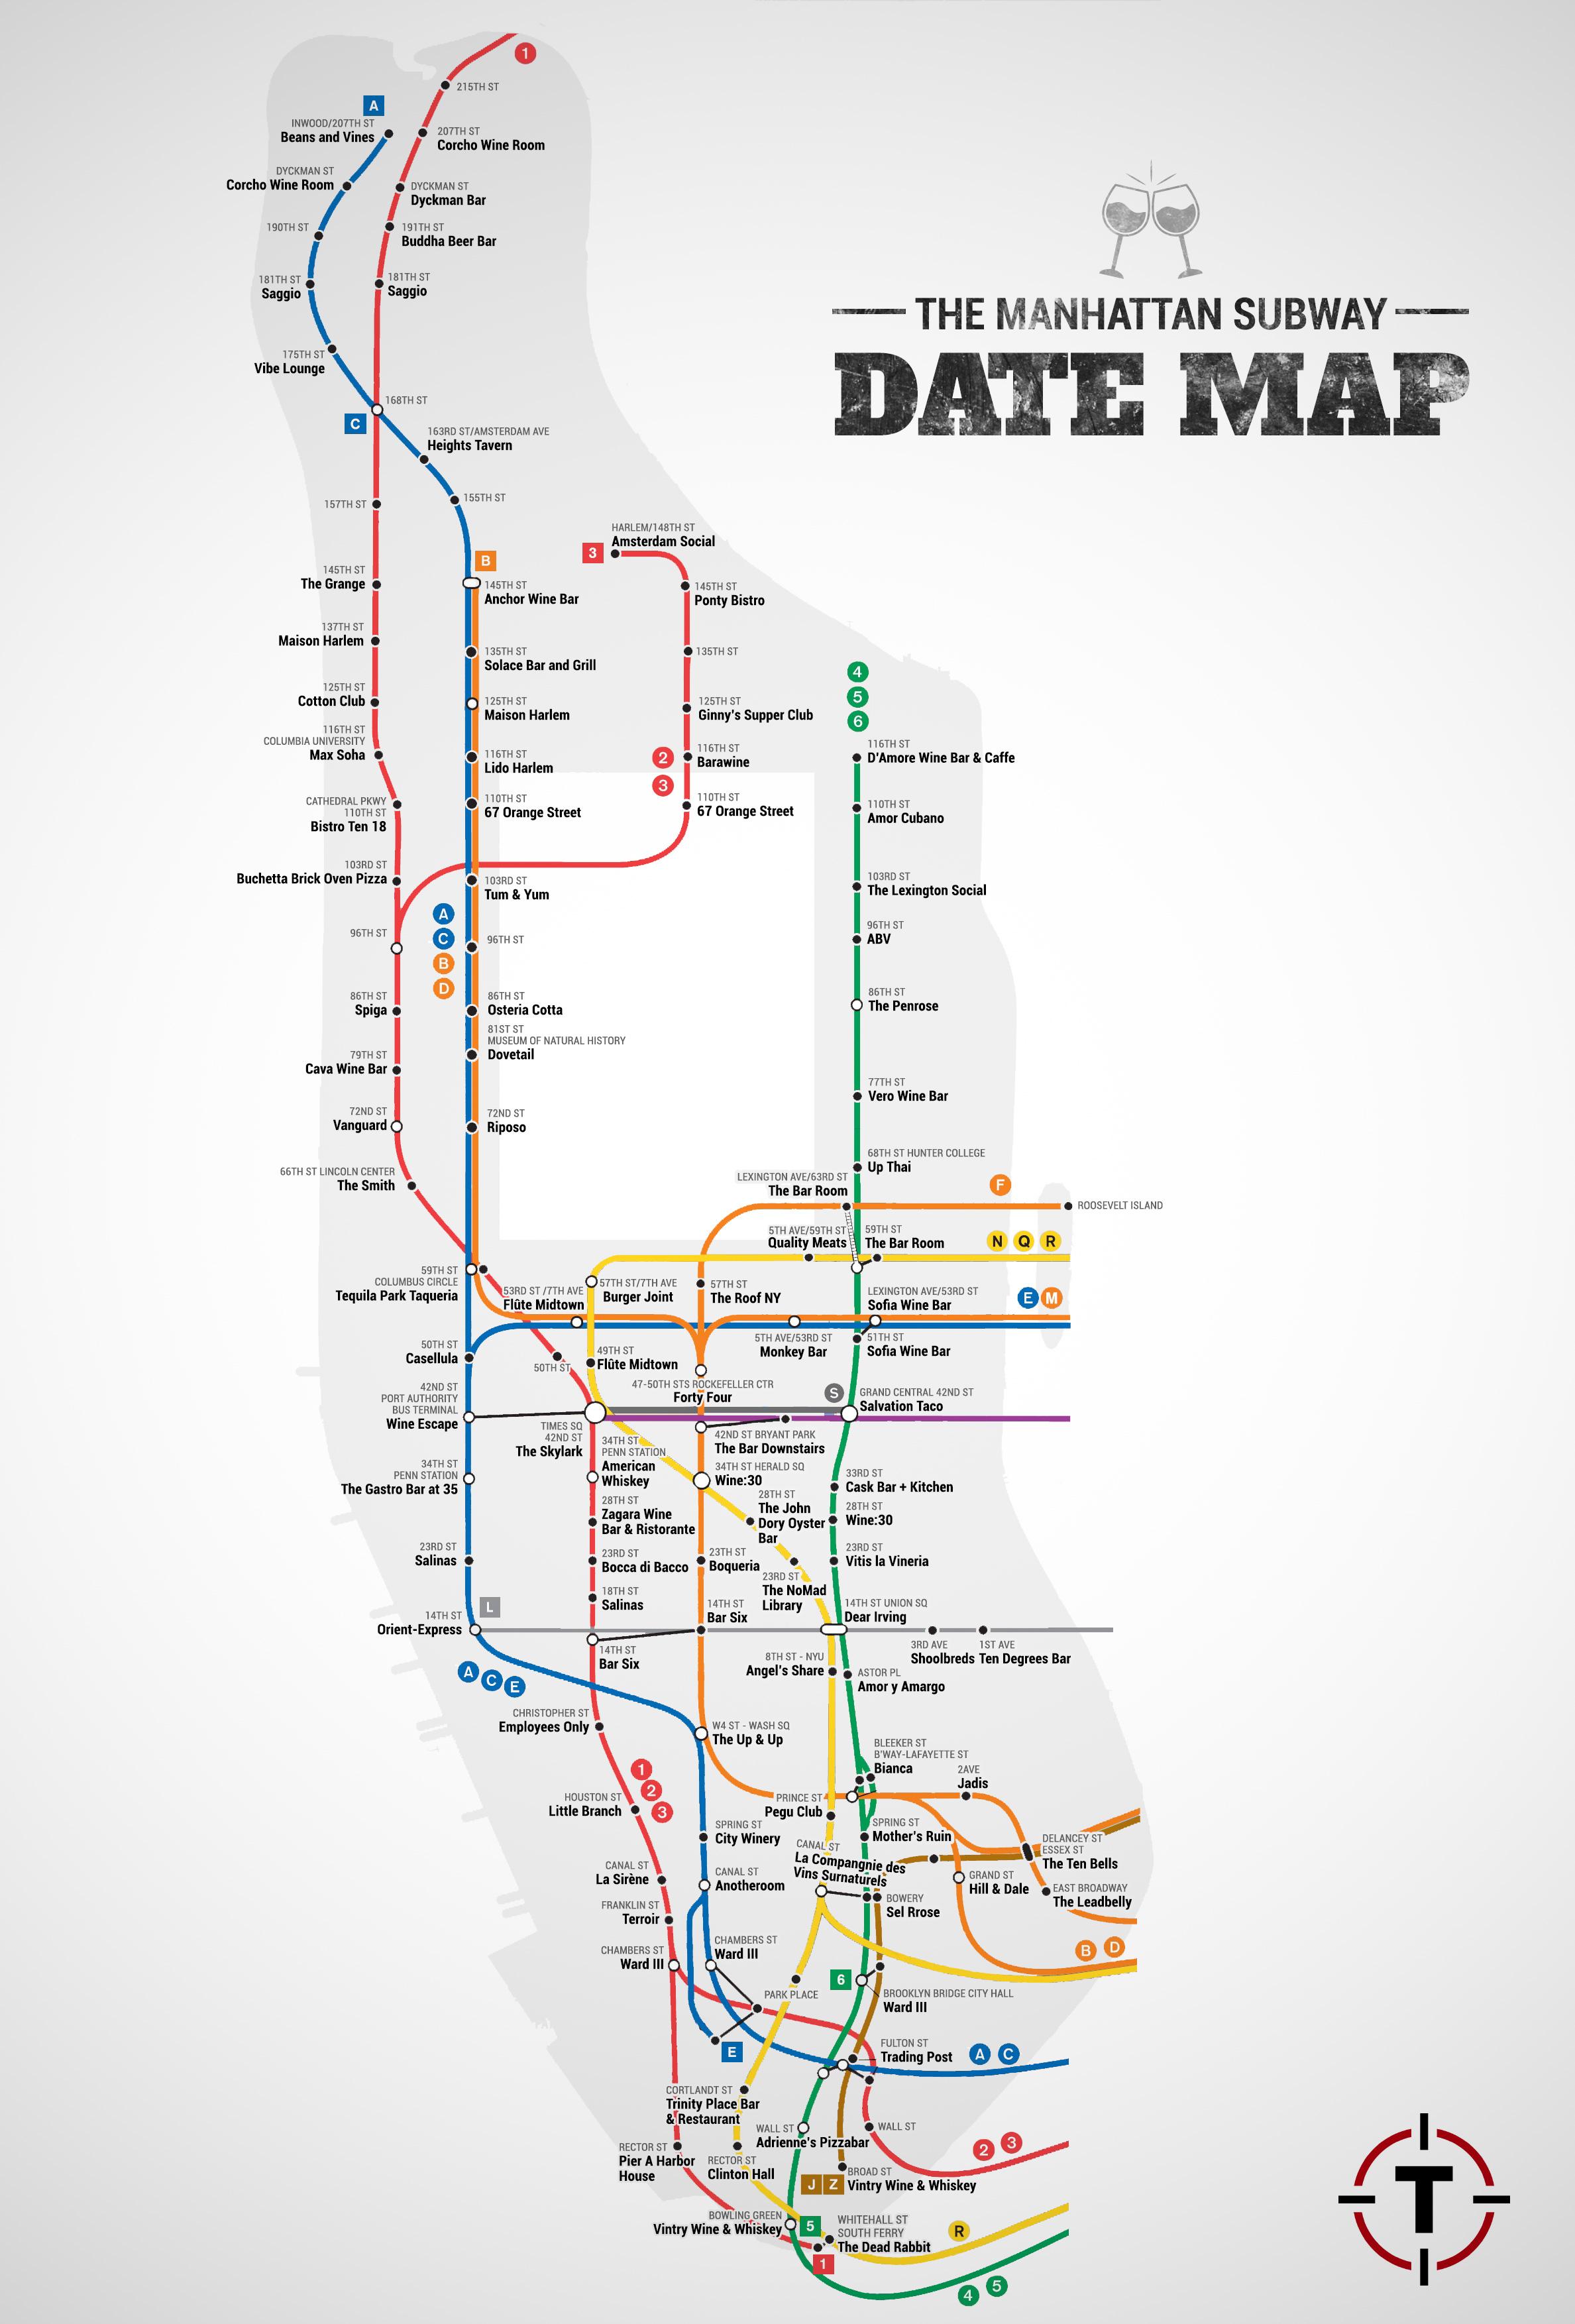 Nyc Subway Map A C E.Manhattan Subway Date Map Date Ideas Bars Restaurants Thrillist